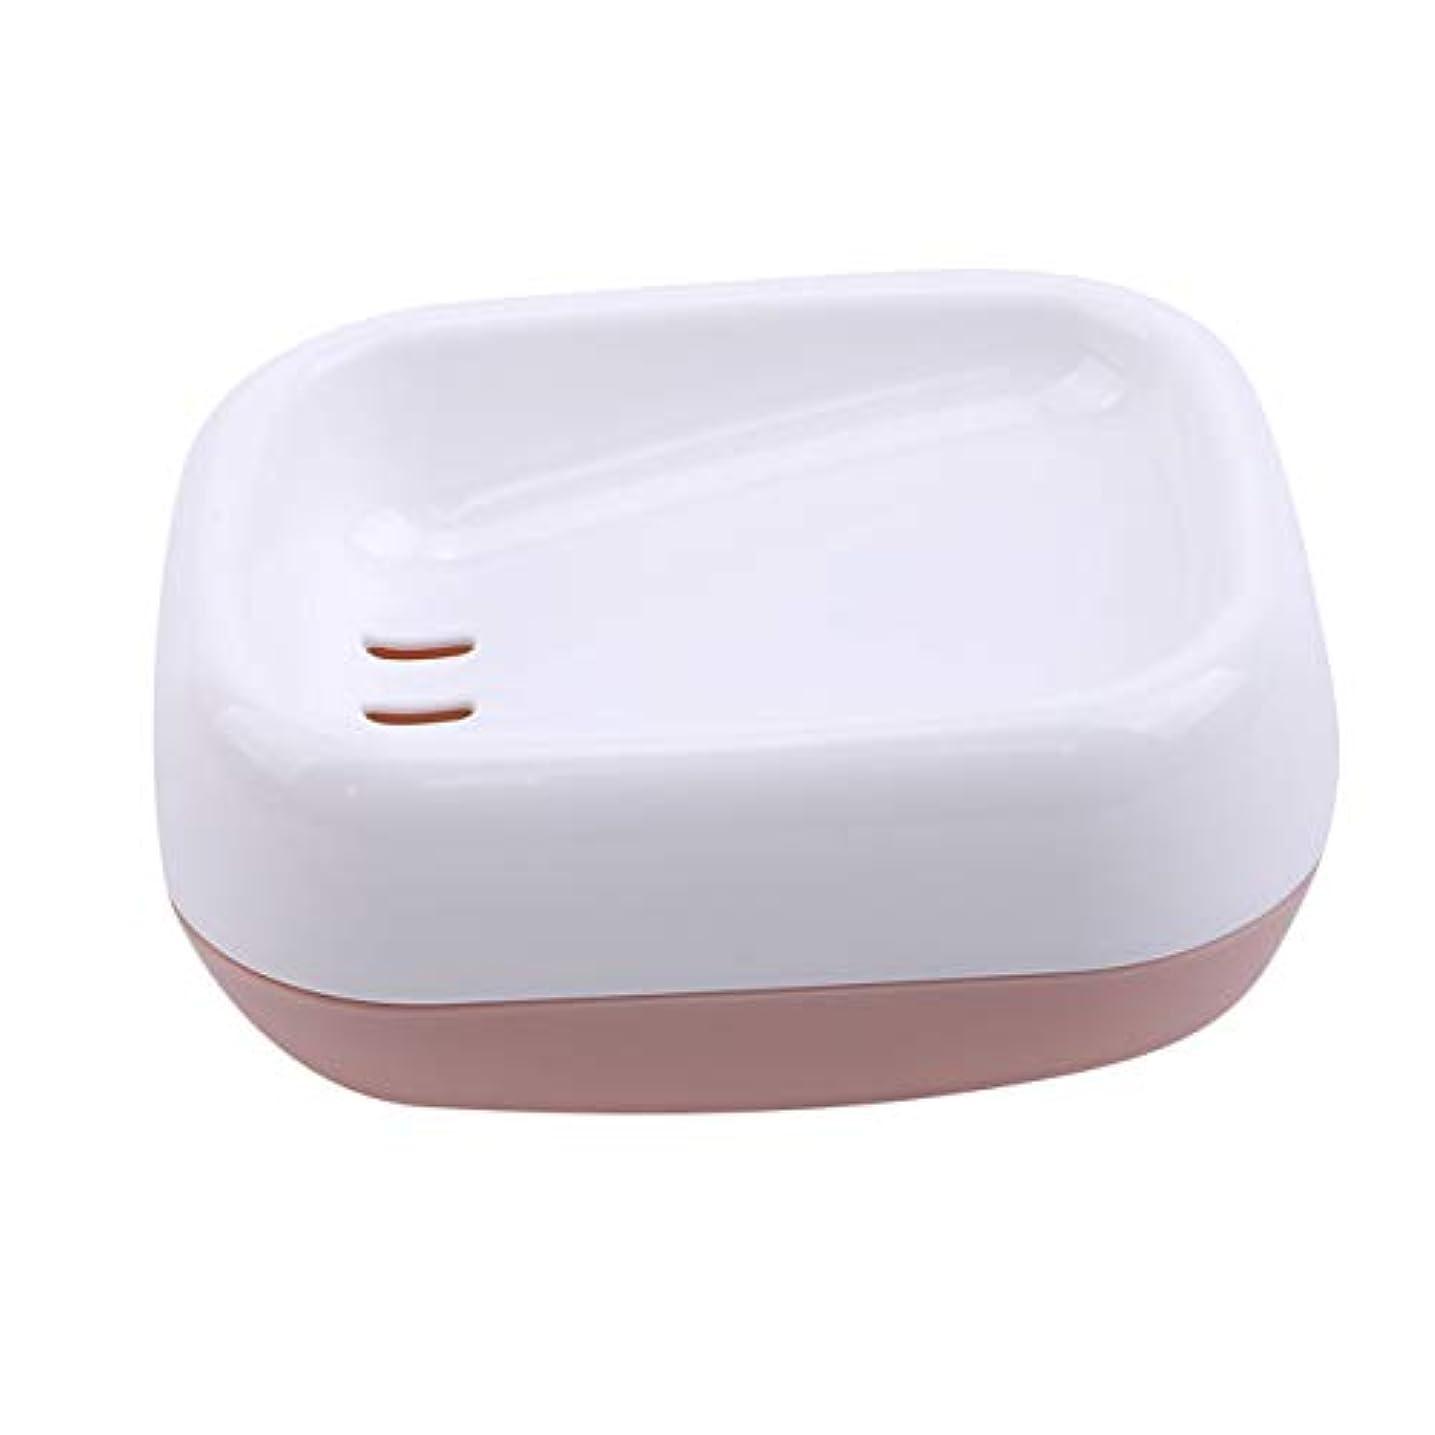 ZALINGソープディッシュボックス浴室プラスチック二重層衛生的なシンプル排水コンテナソープディッシュピンク